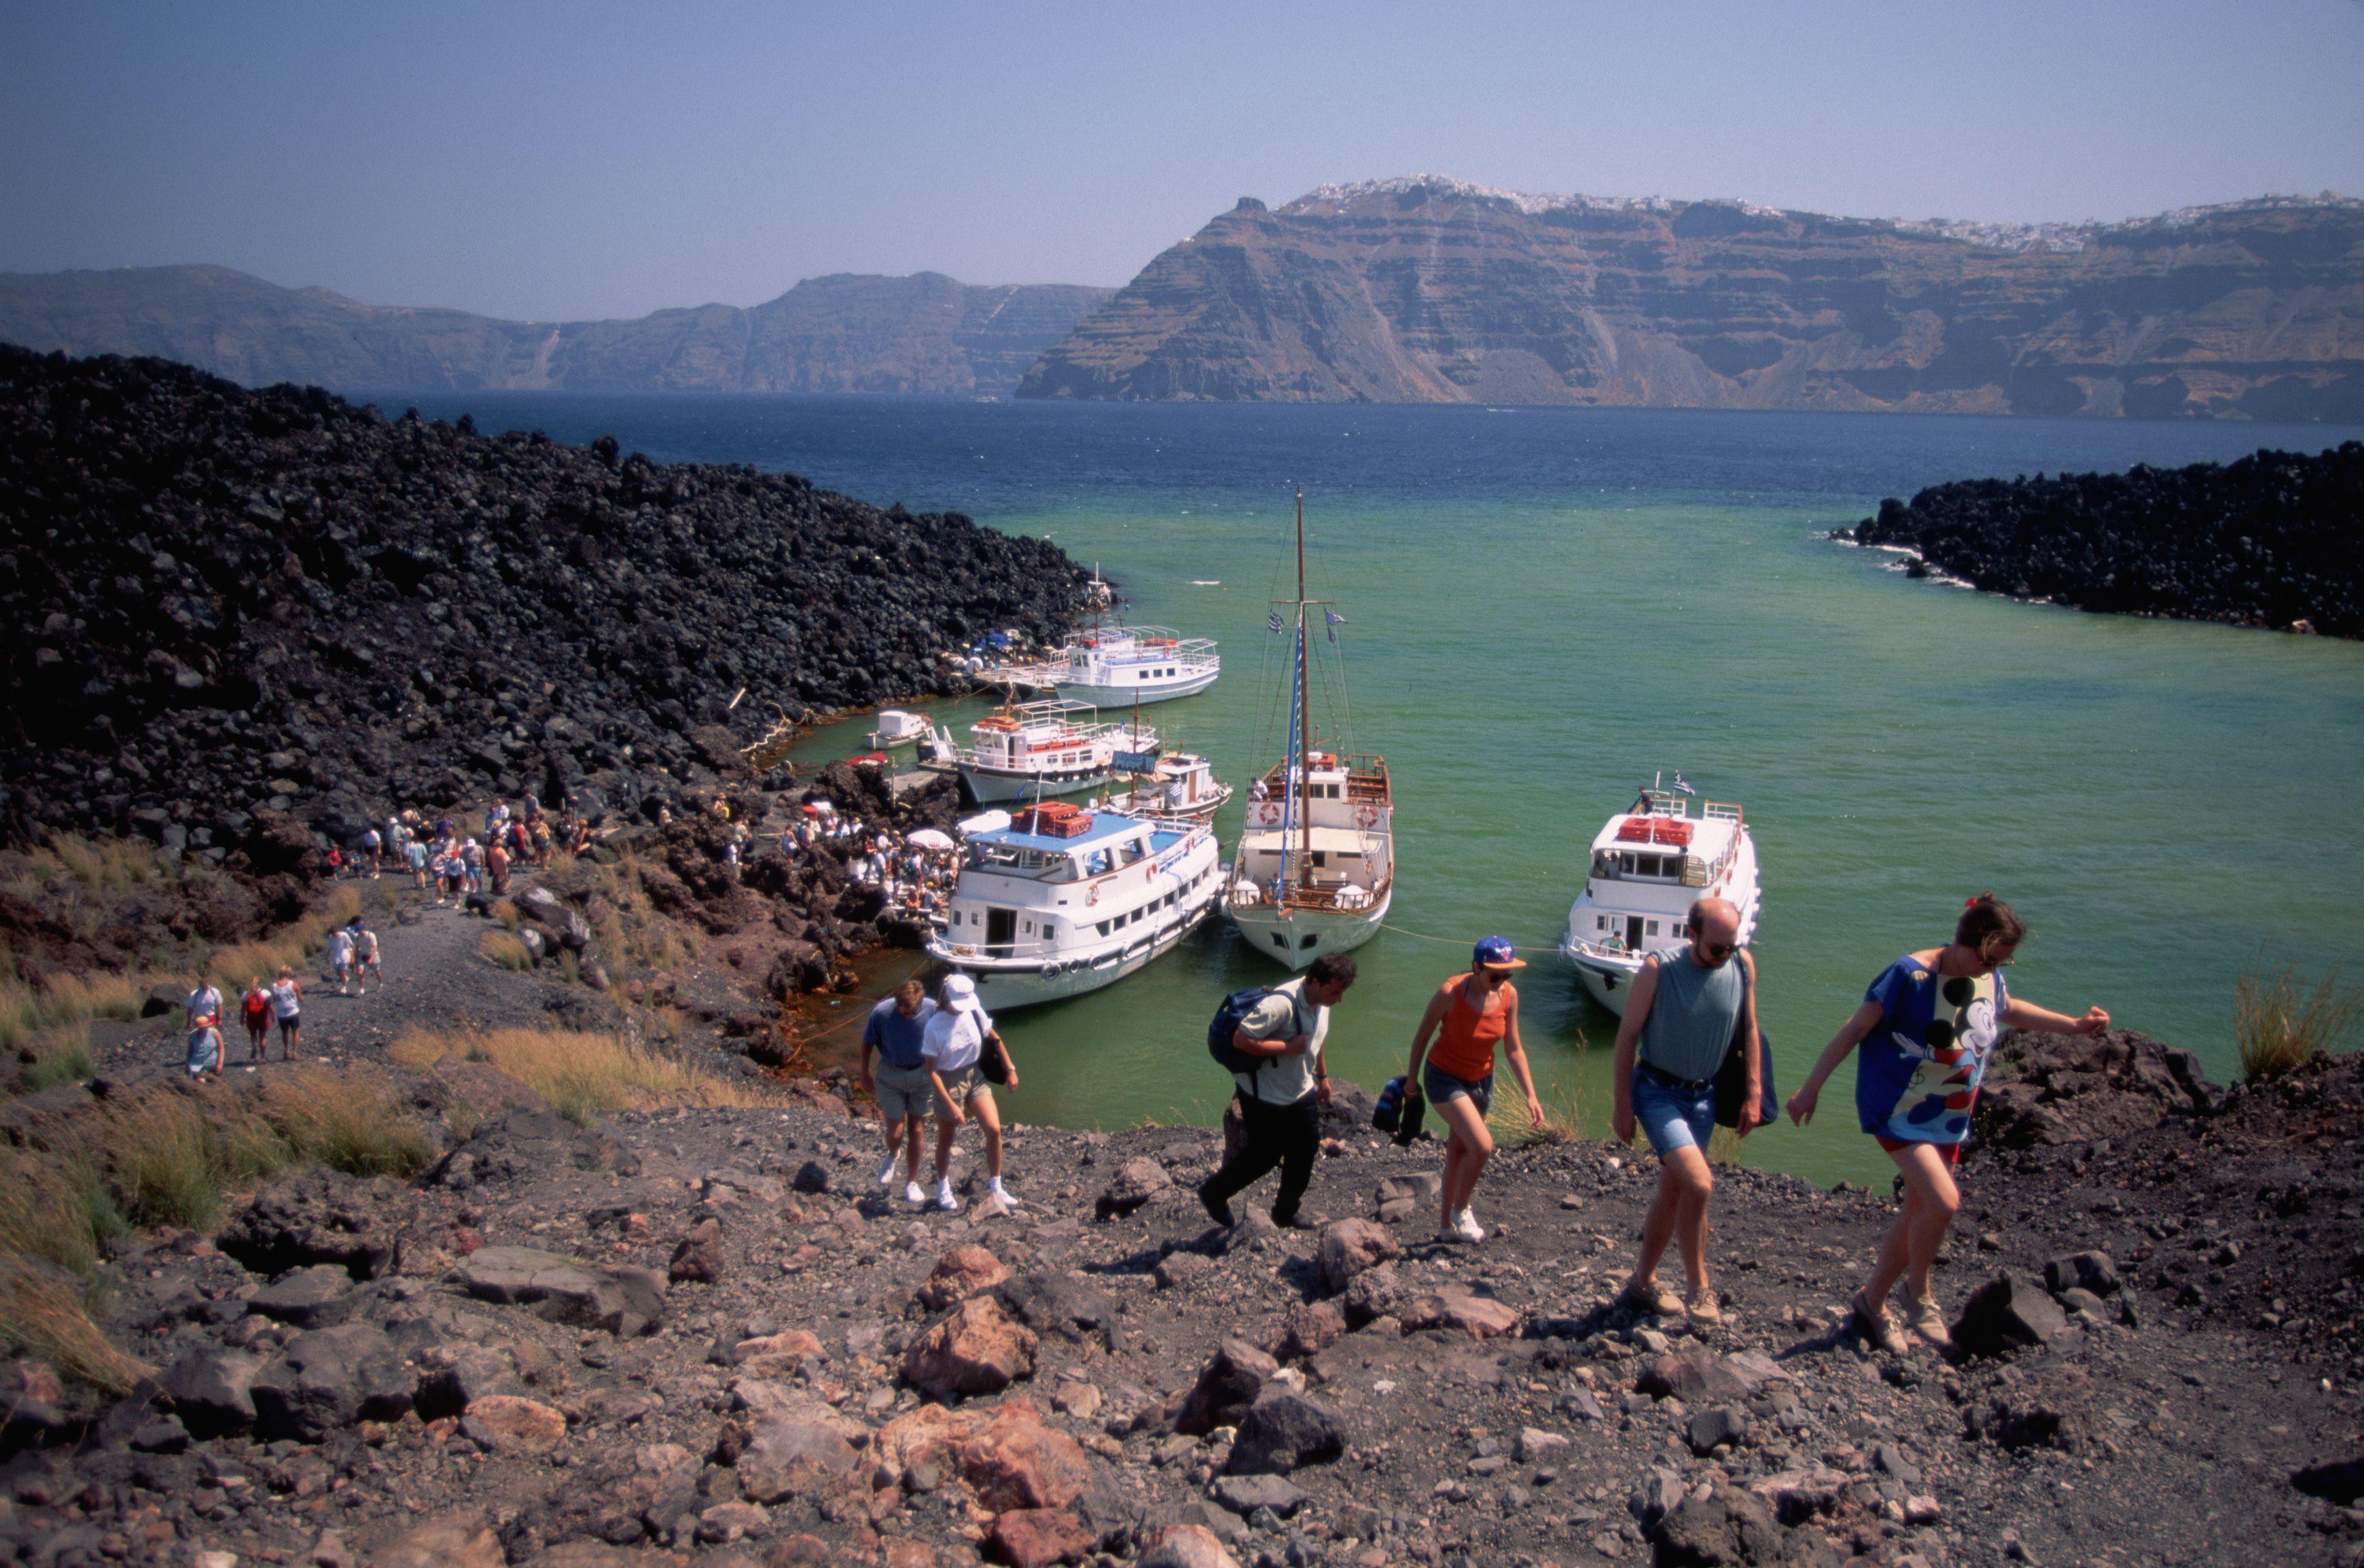 Hiking the Volcanic Island of Nea Kameni